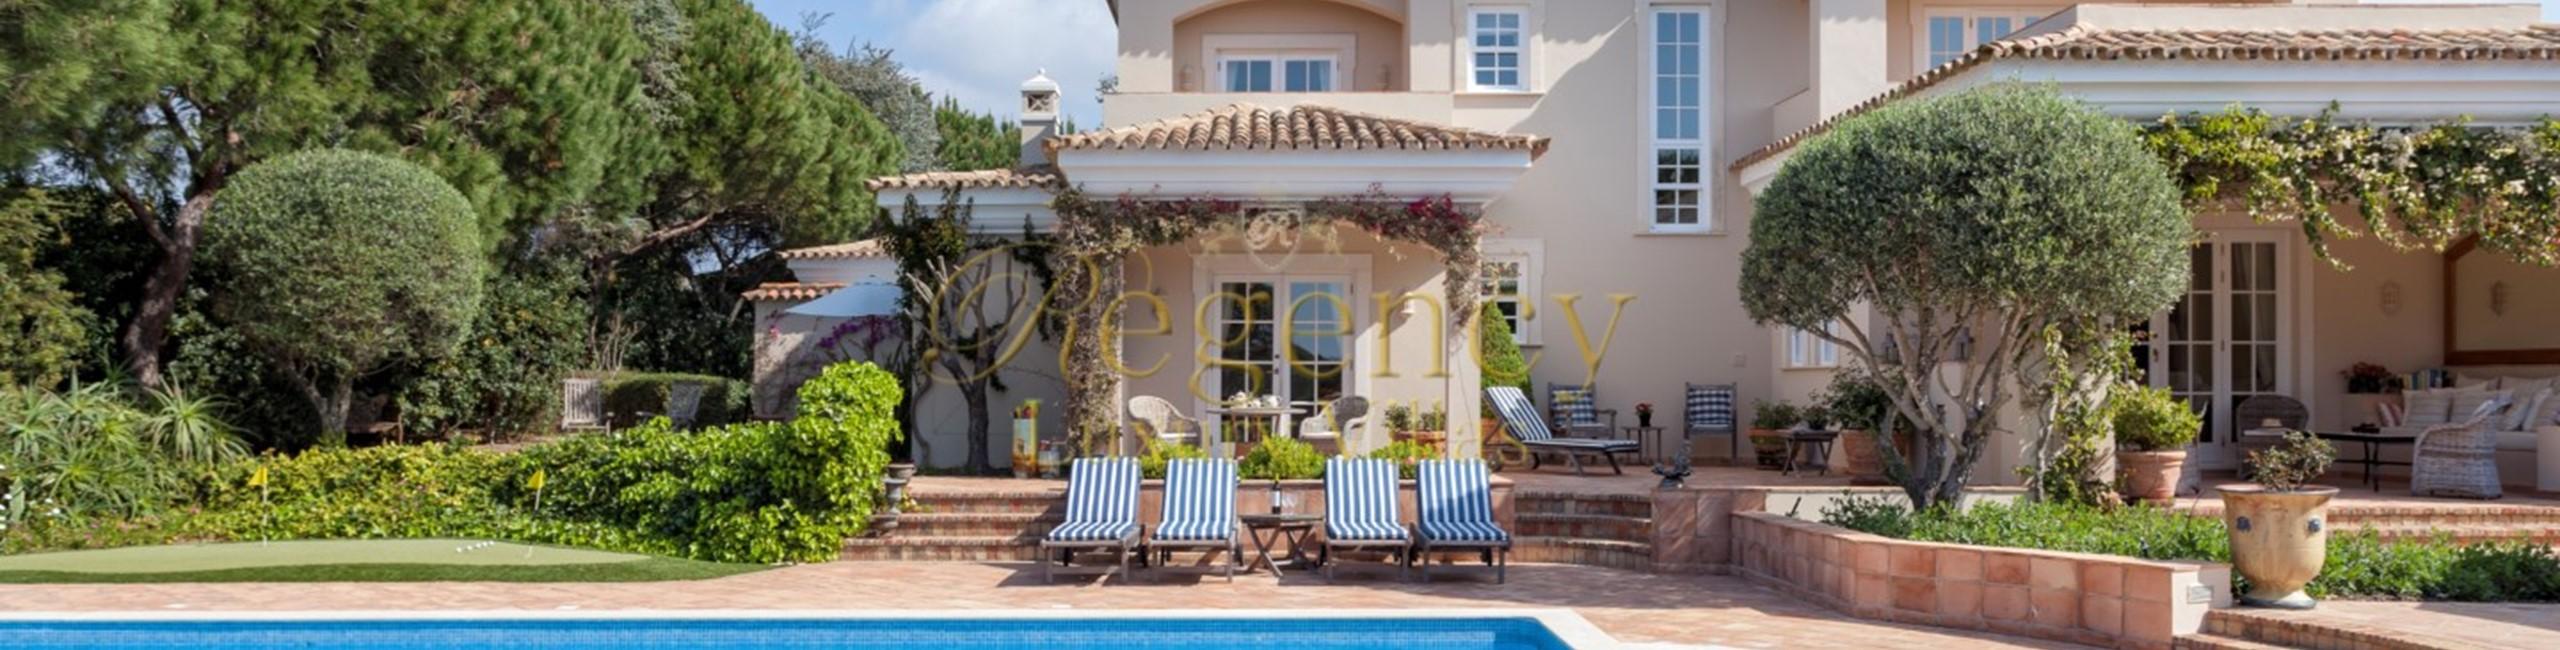 To Rent 3 Bedroom Villa In Quinta Do Lago Regency Luxury Villas 1